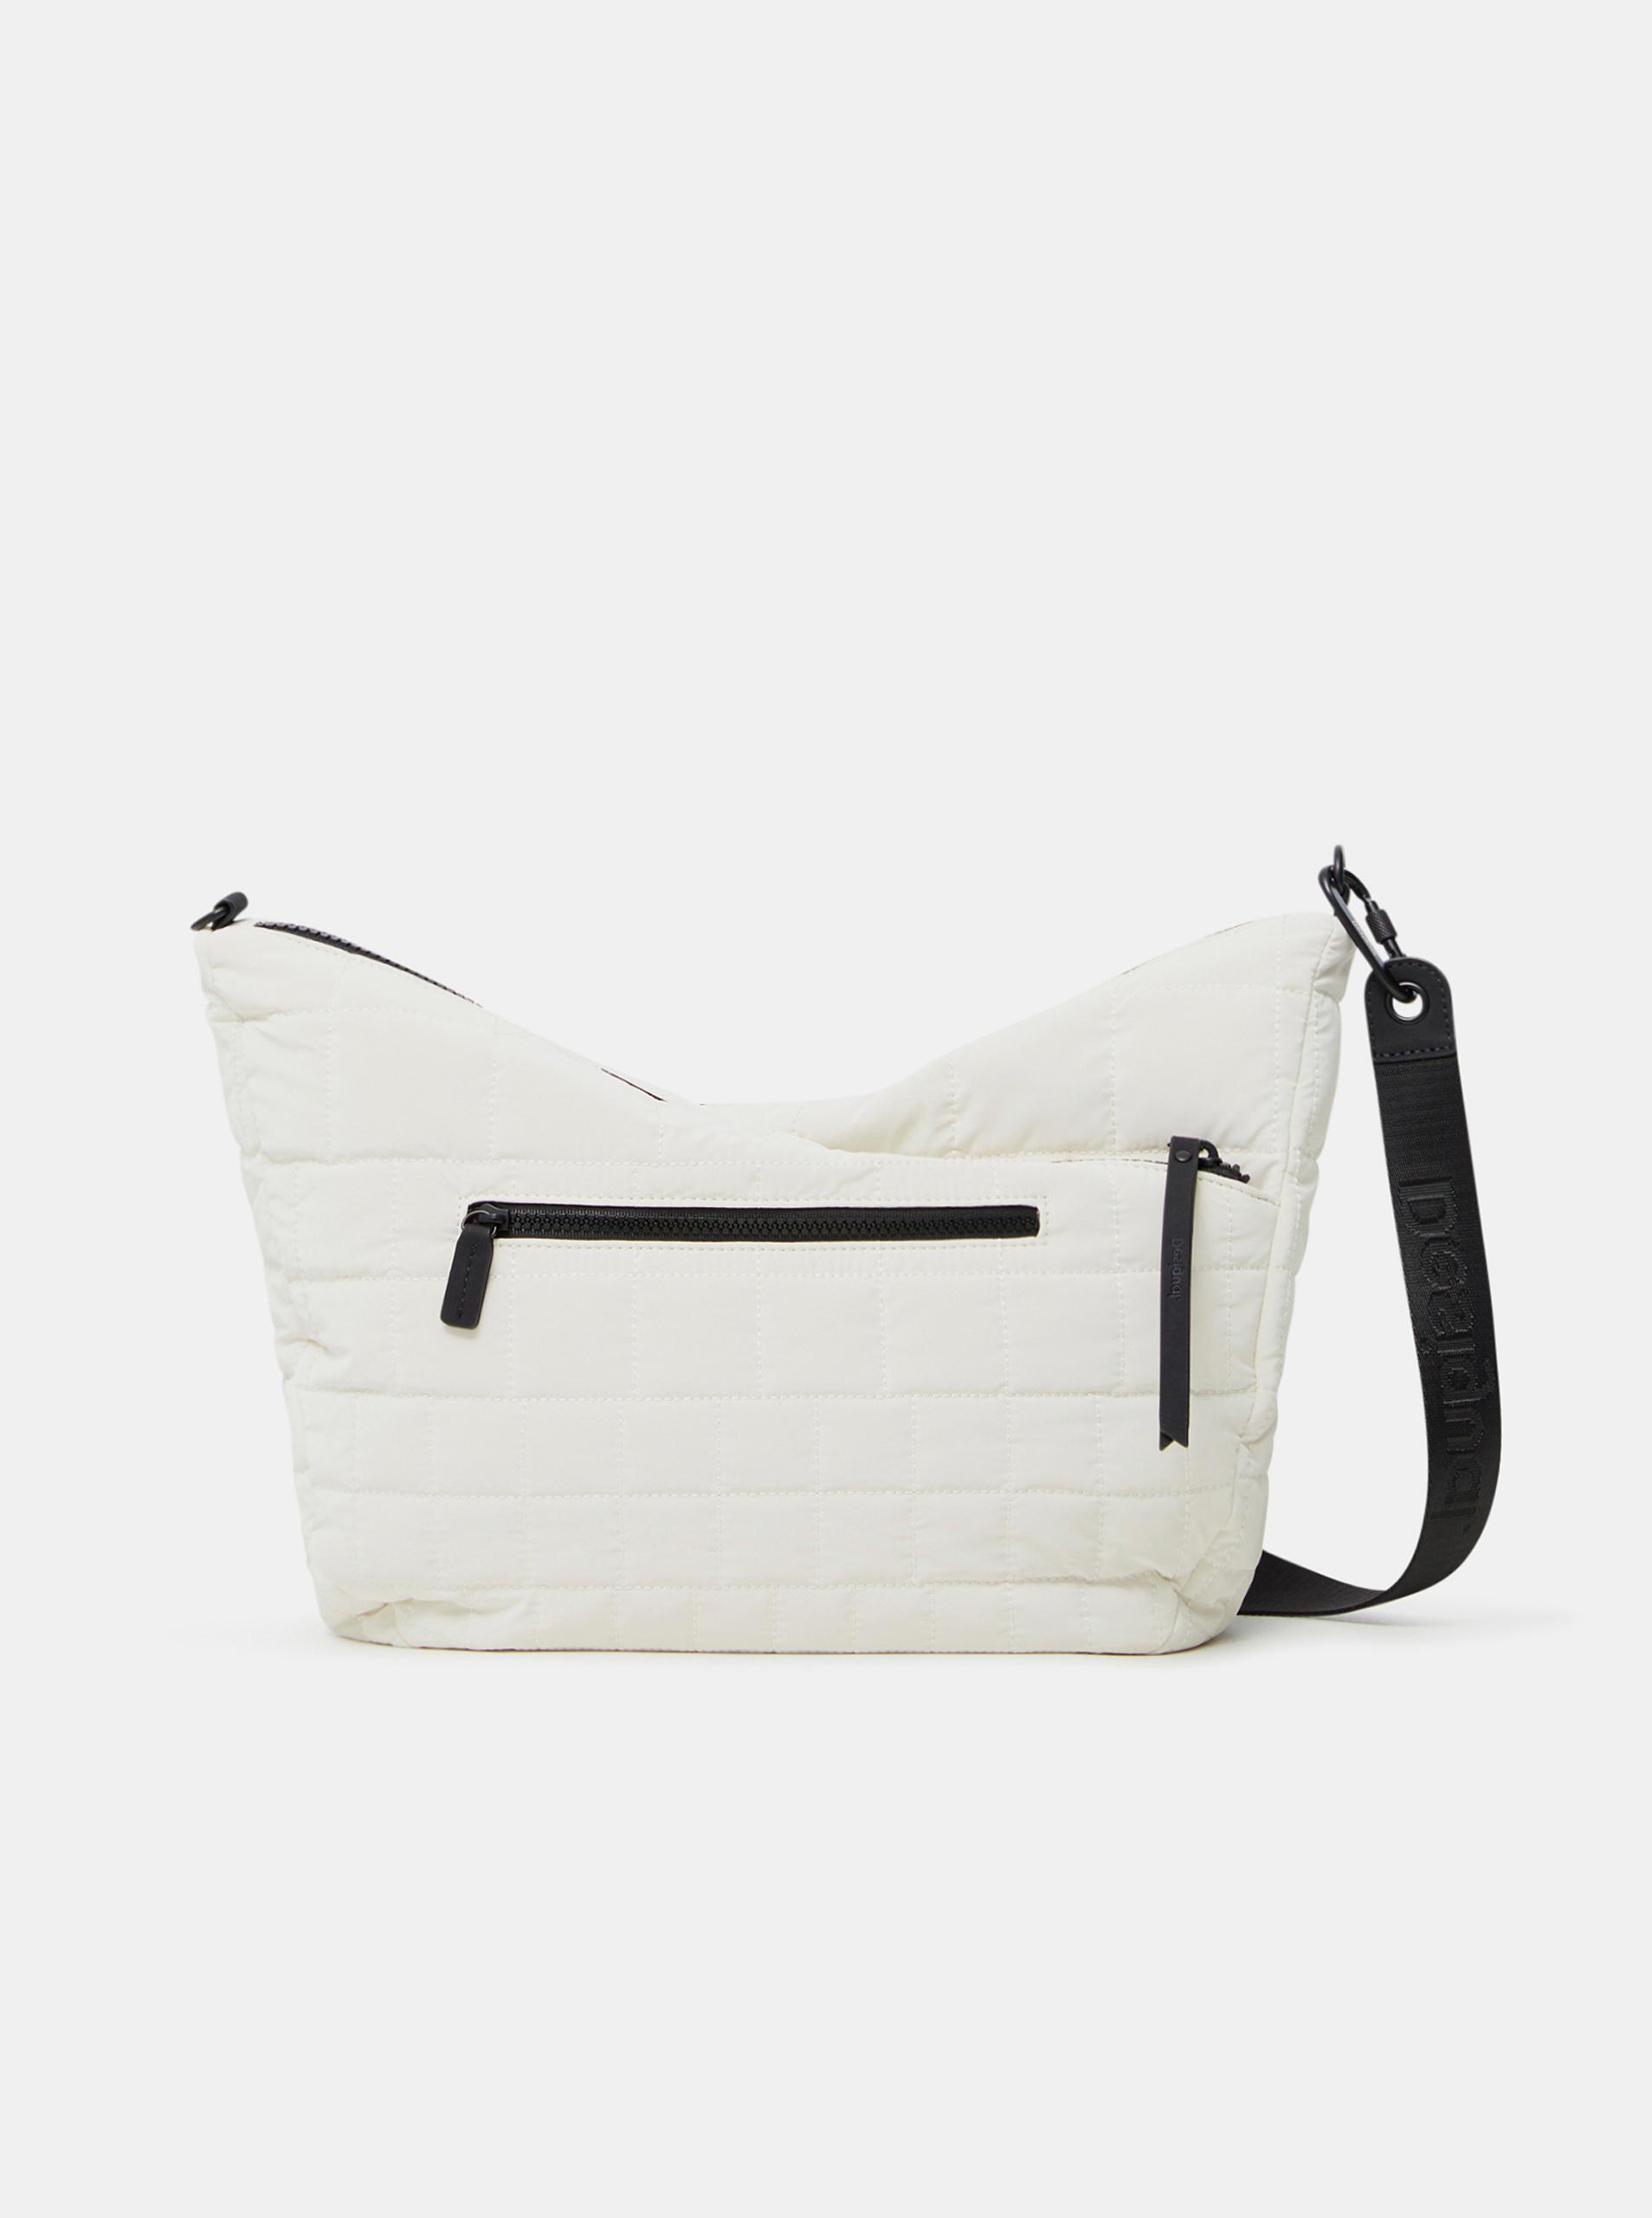 Desigual albe geanta COcoa Harry 2.0 Maxy